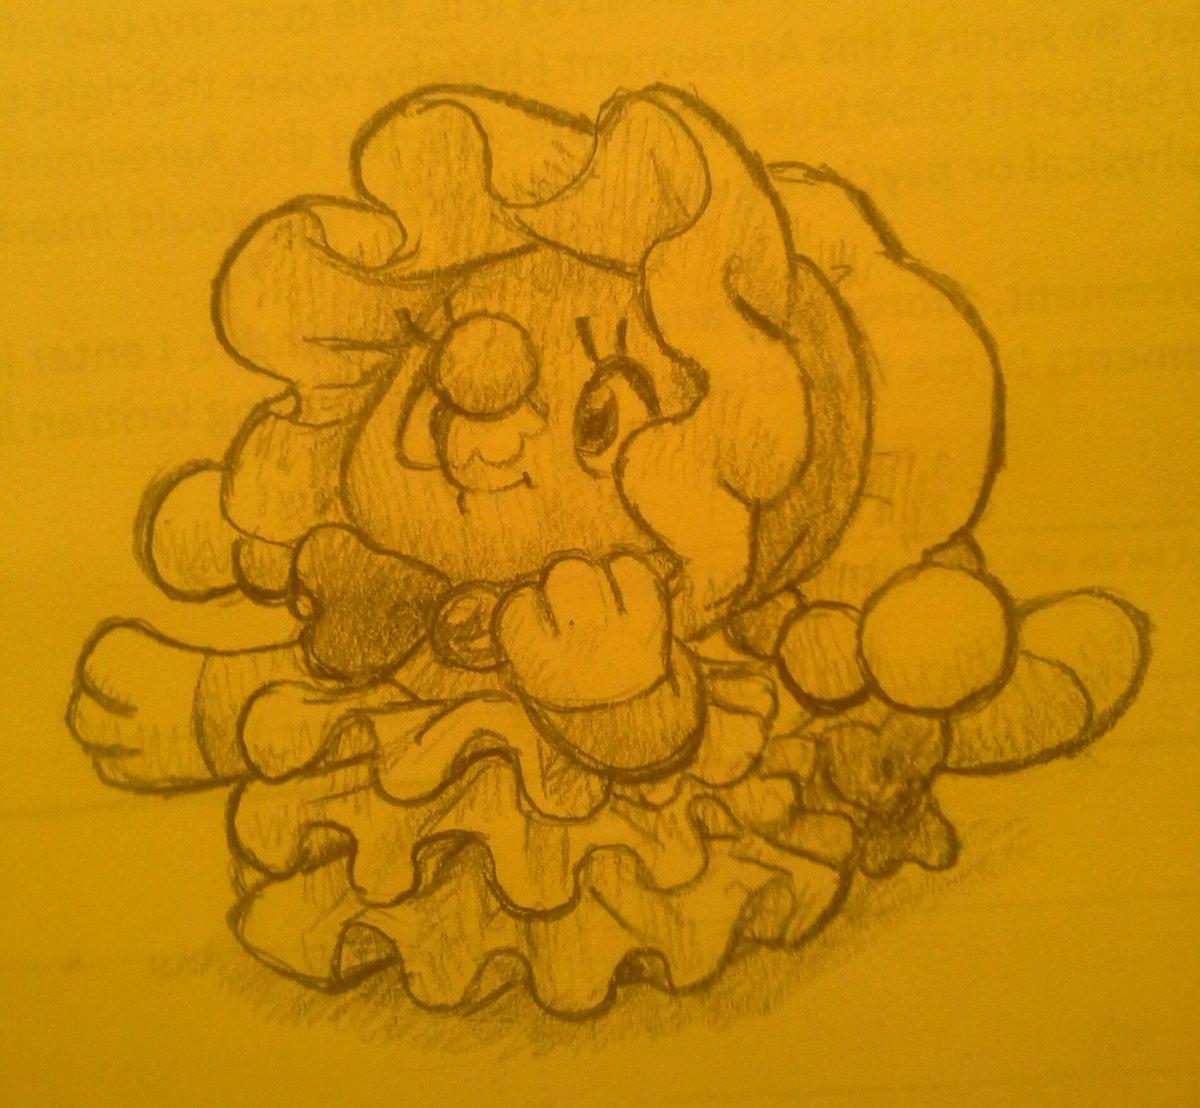 The dear is here #PokemonSunMoon #brionne https://t.co/GsfZPqyTwl